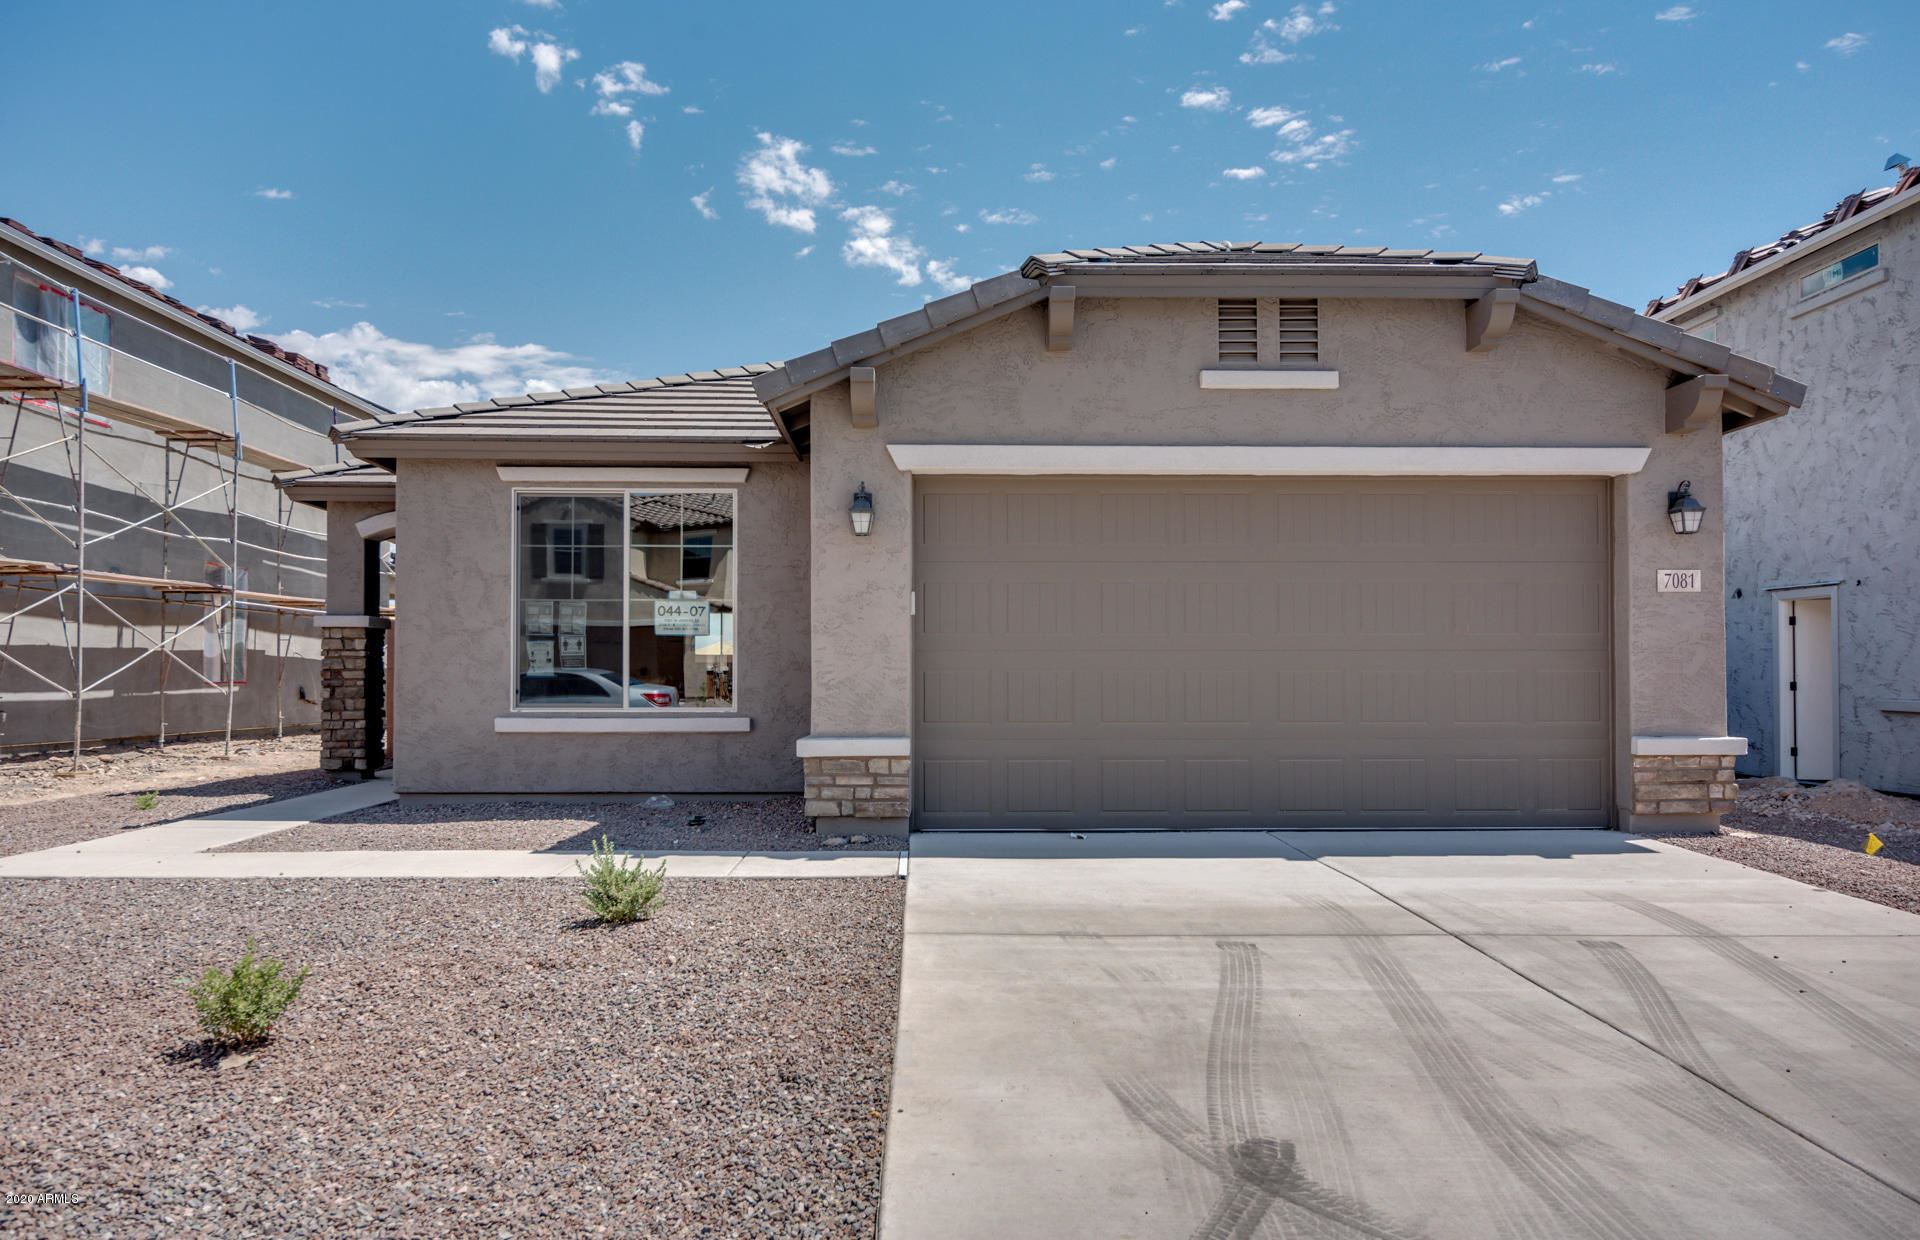 7081 W ANDREA Drive, Peoria, AZ 85383 - #: 6077249